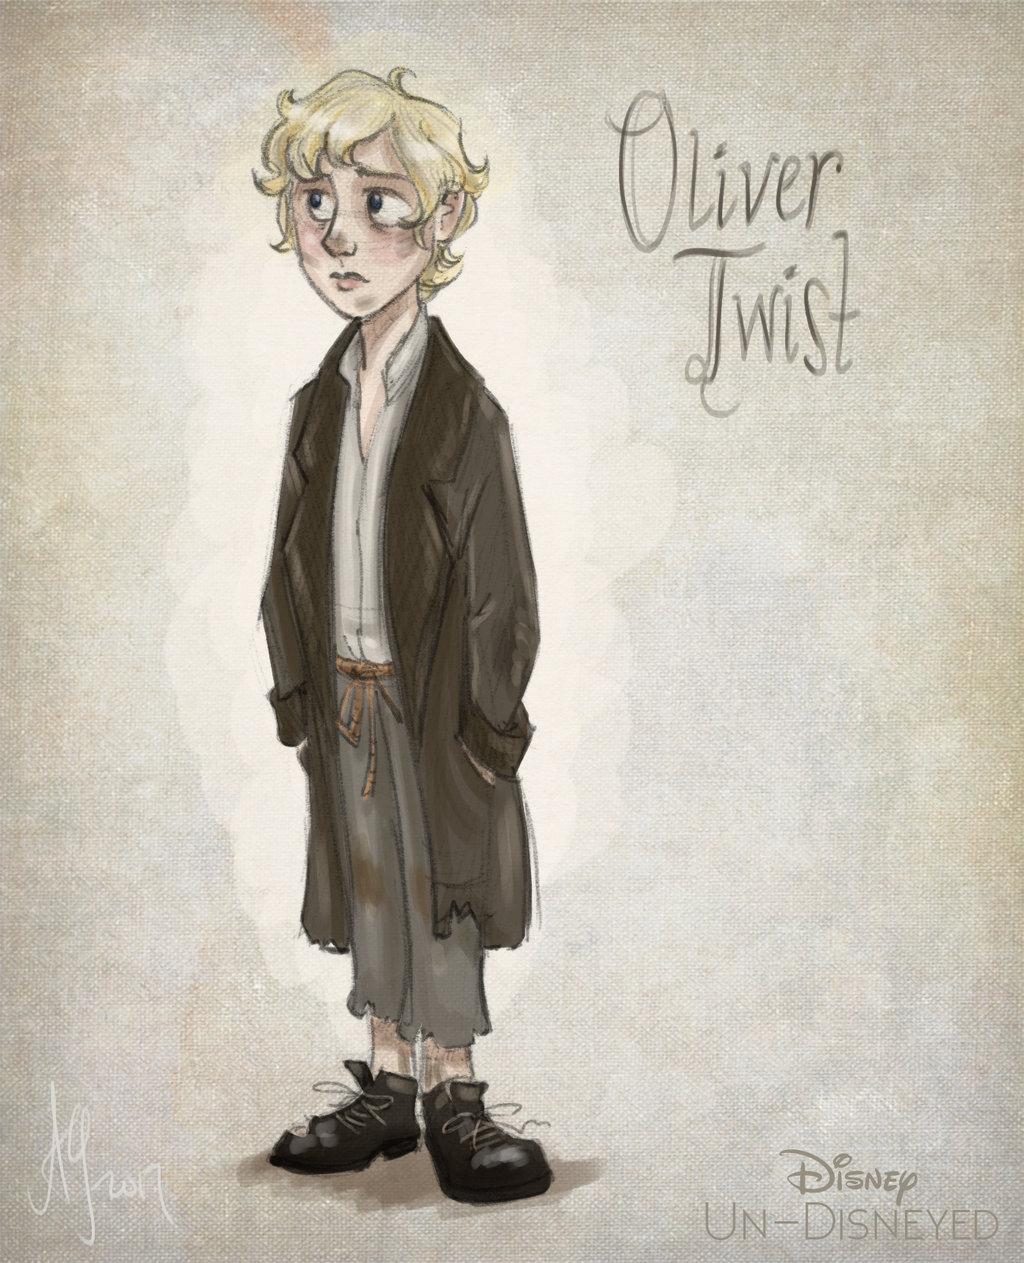 Disney Un Disneyed Oliver Twist P by kuabci 1024x1263